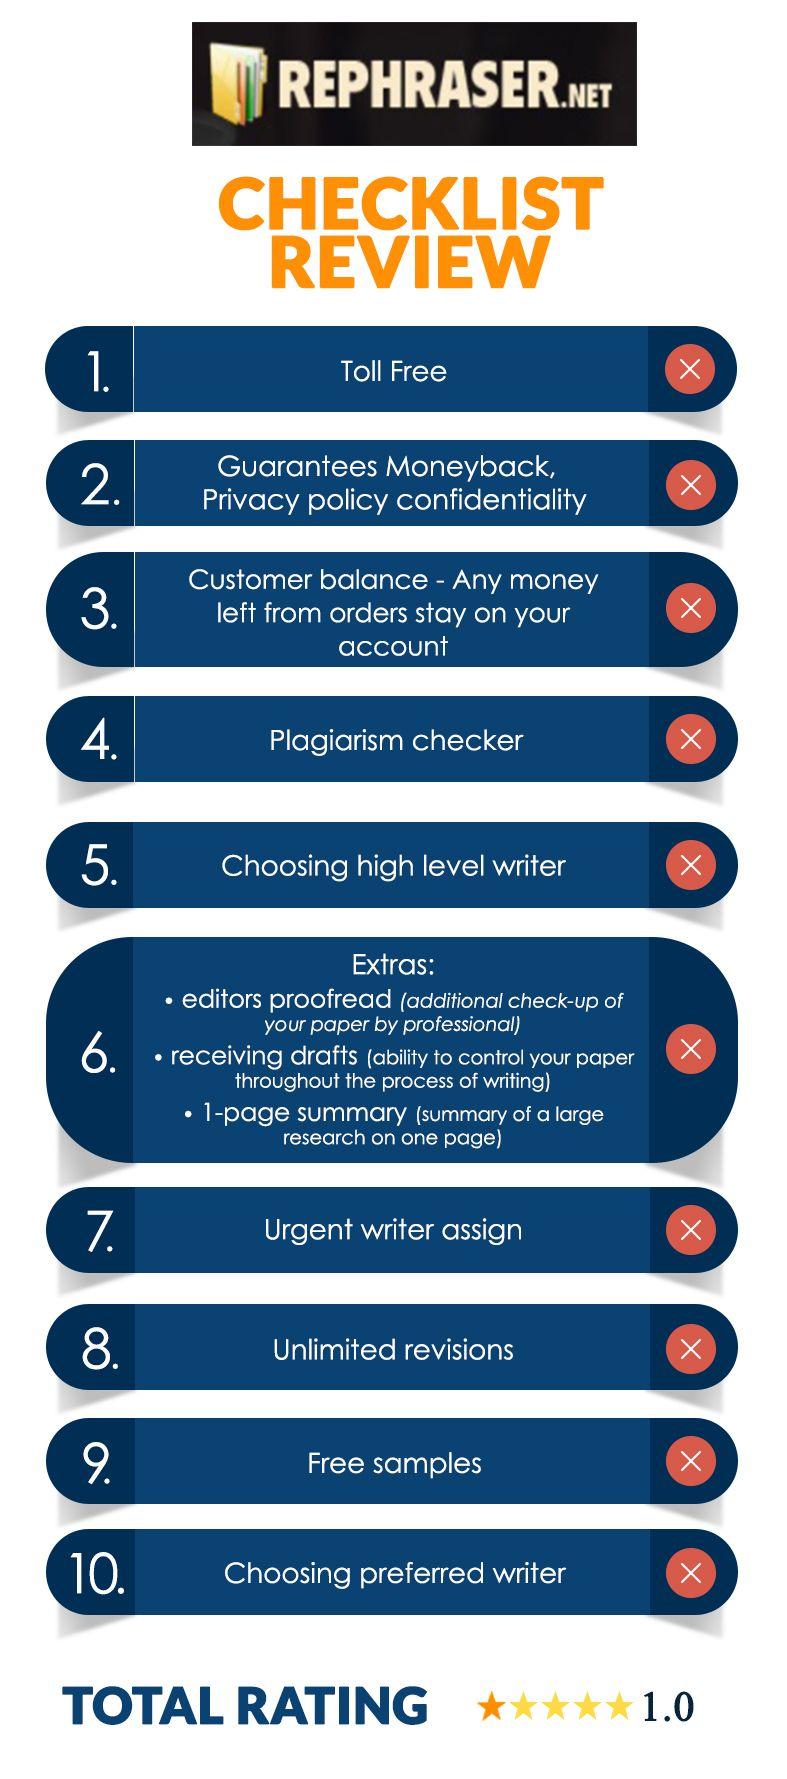 009 Essay Checker Free Online Amazing Sentence Grammar Plagiarism Document Full